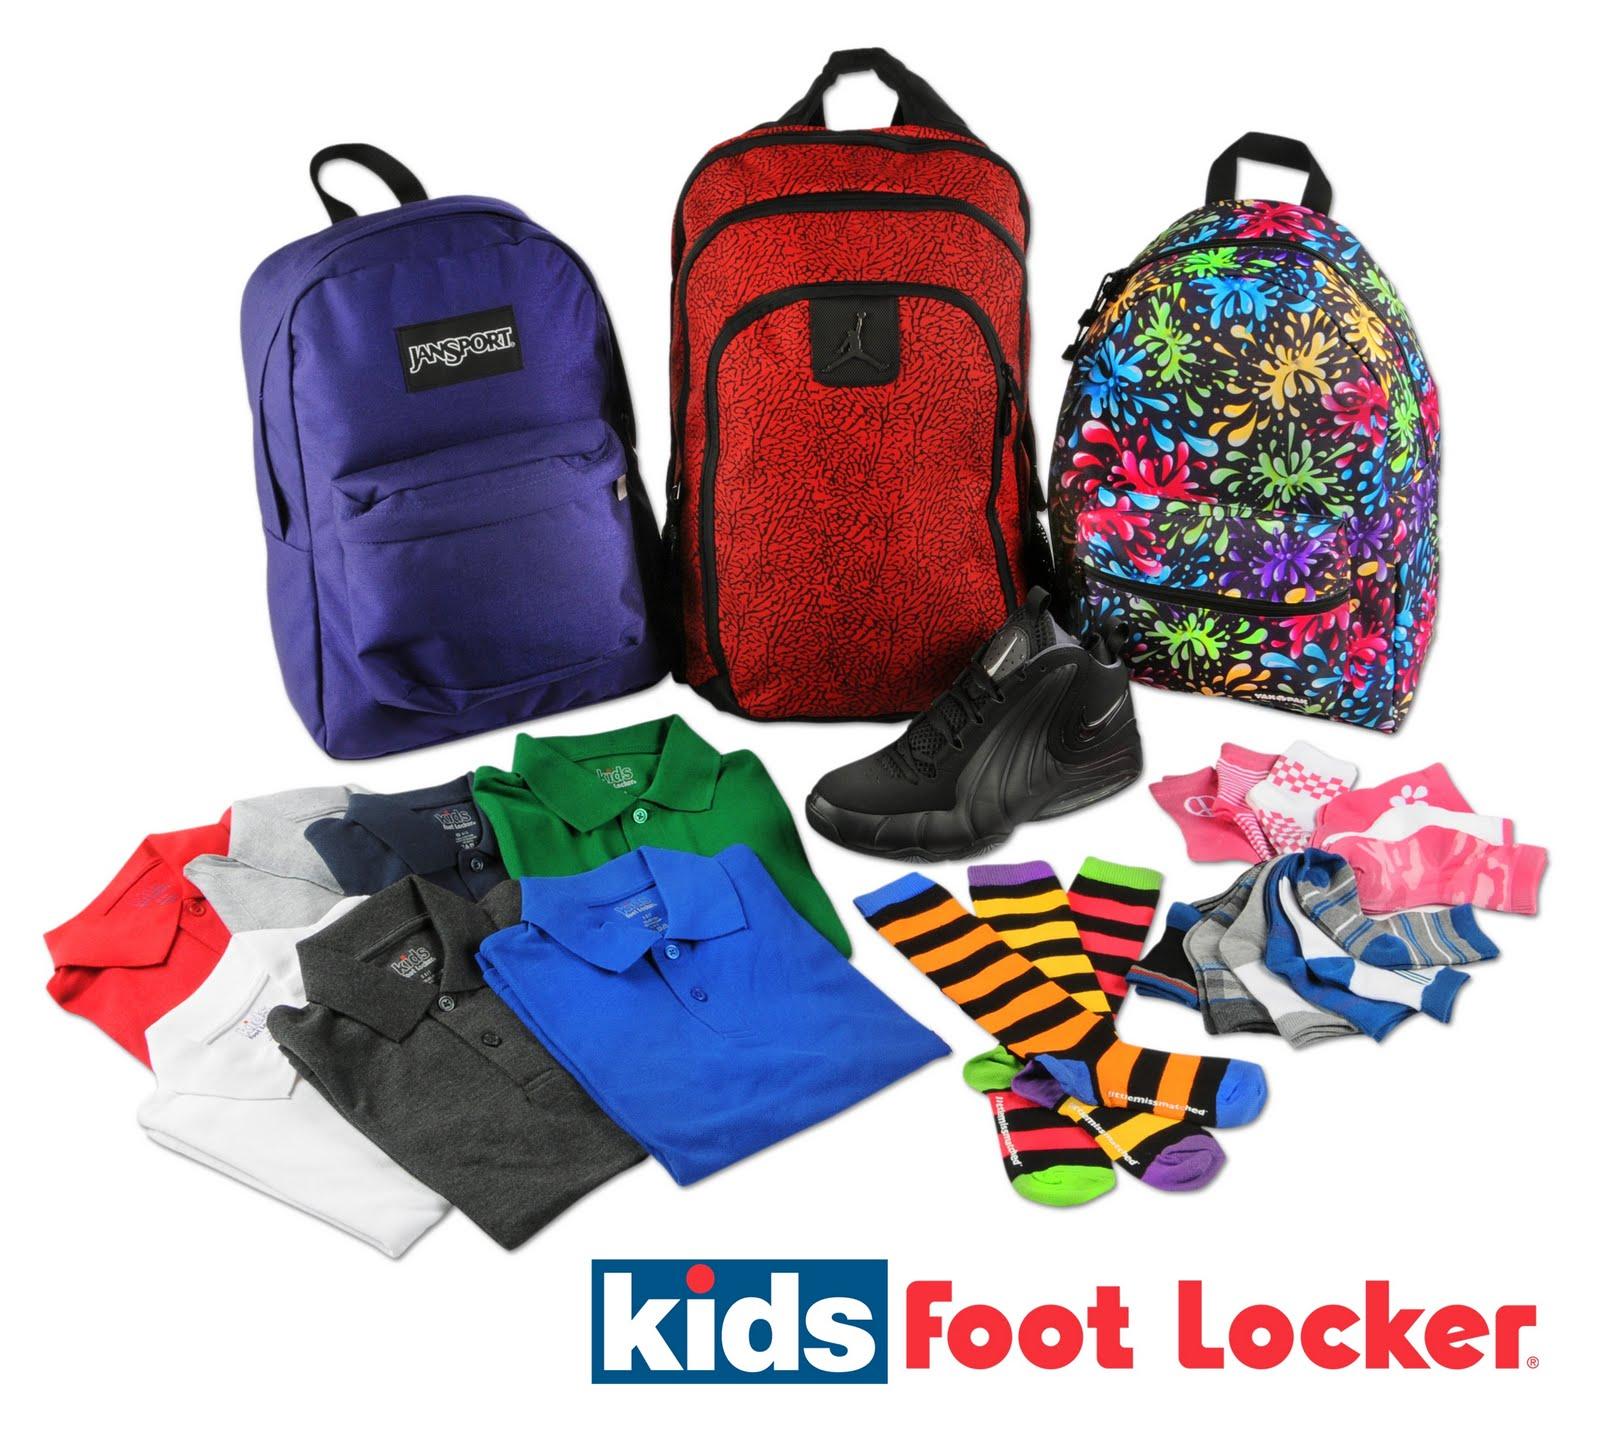 55b05878c8200c What s in Your Locker  Kids Foot Locker Asks